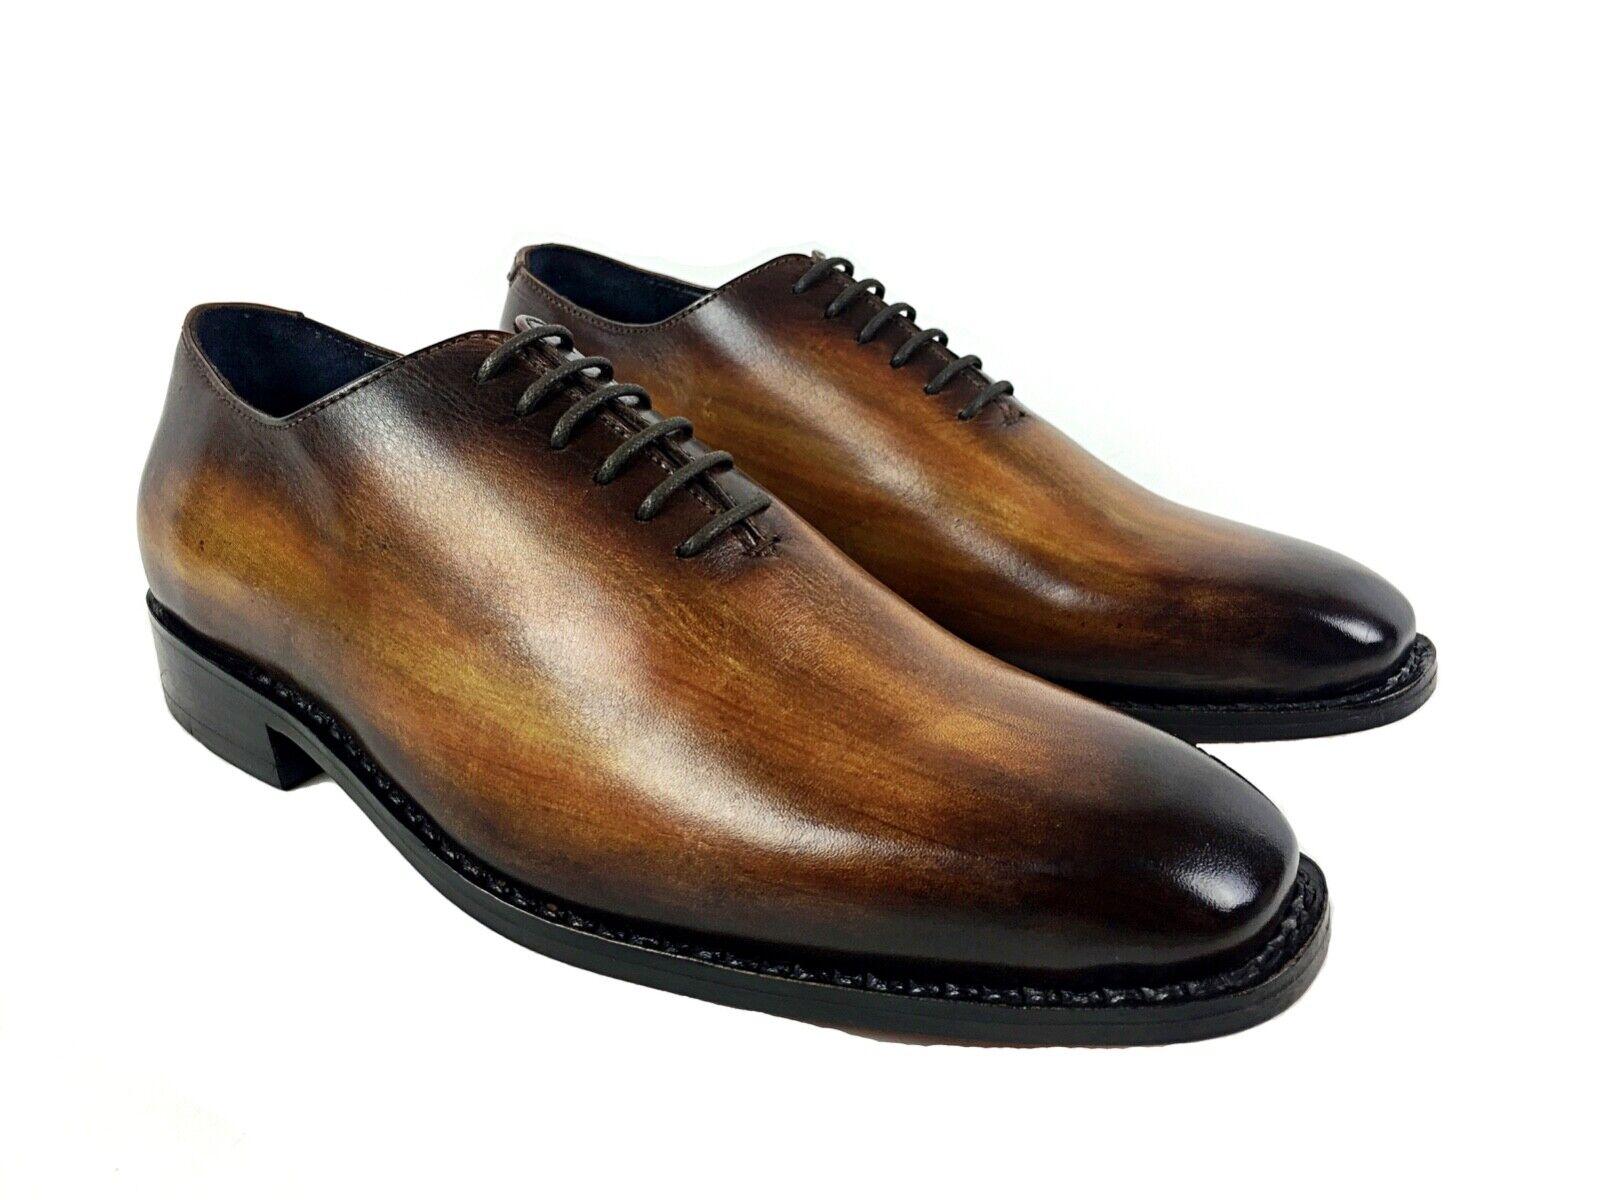 Zapatos de piel para hombre fabricación goodyear welted patina cognac 7UK-41